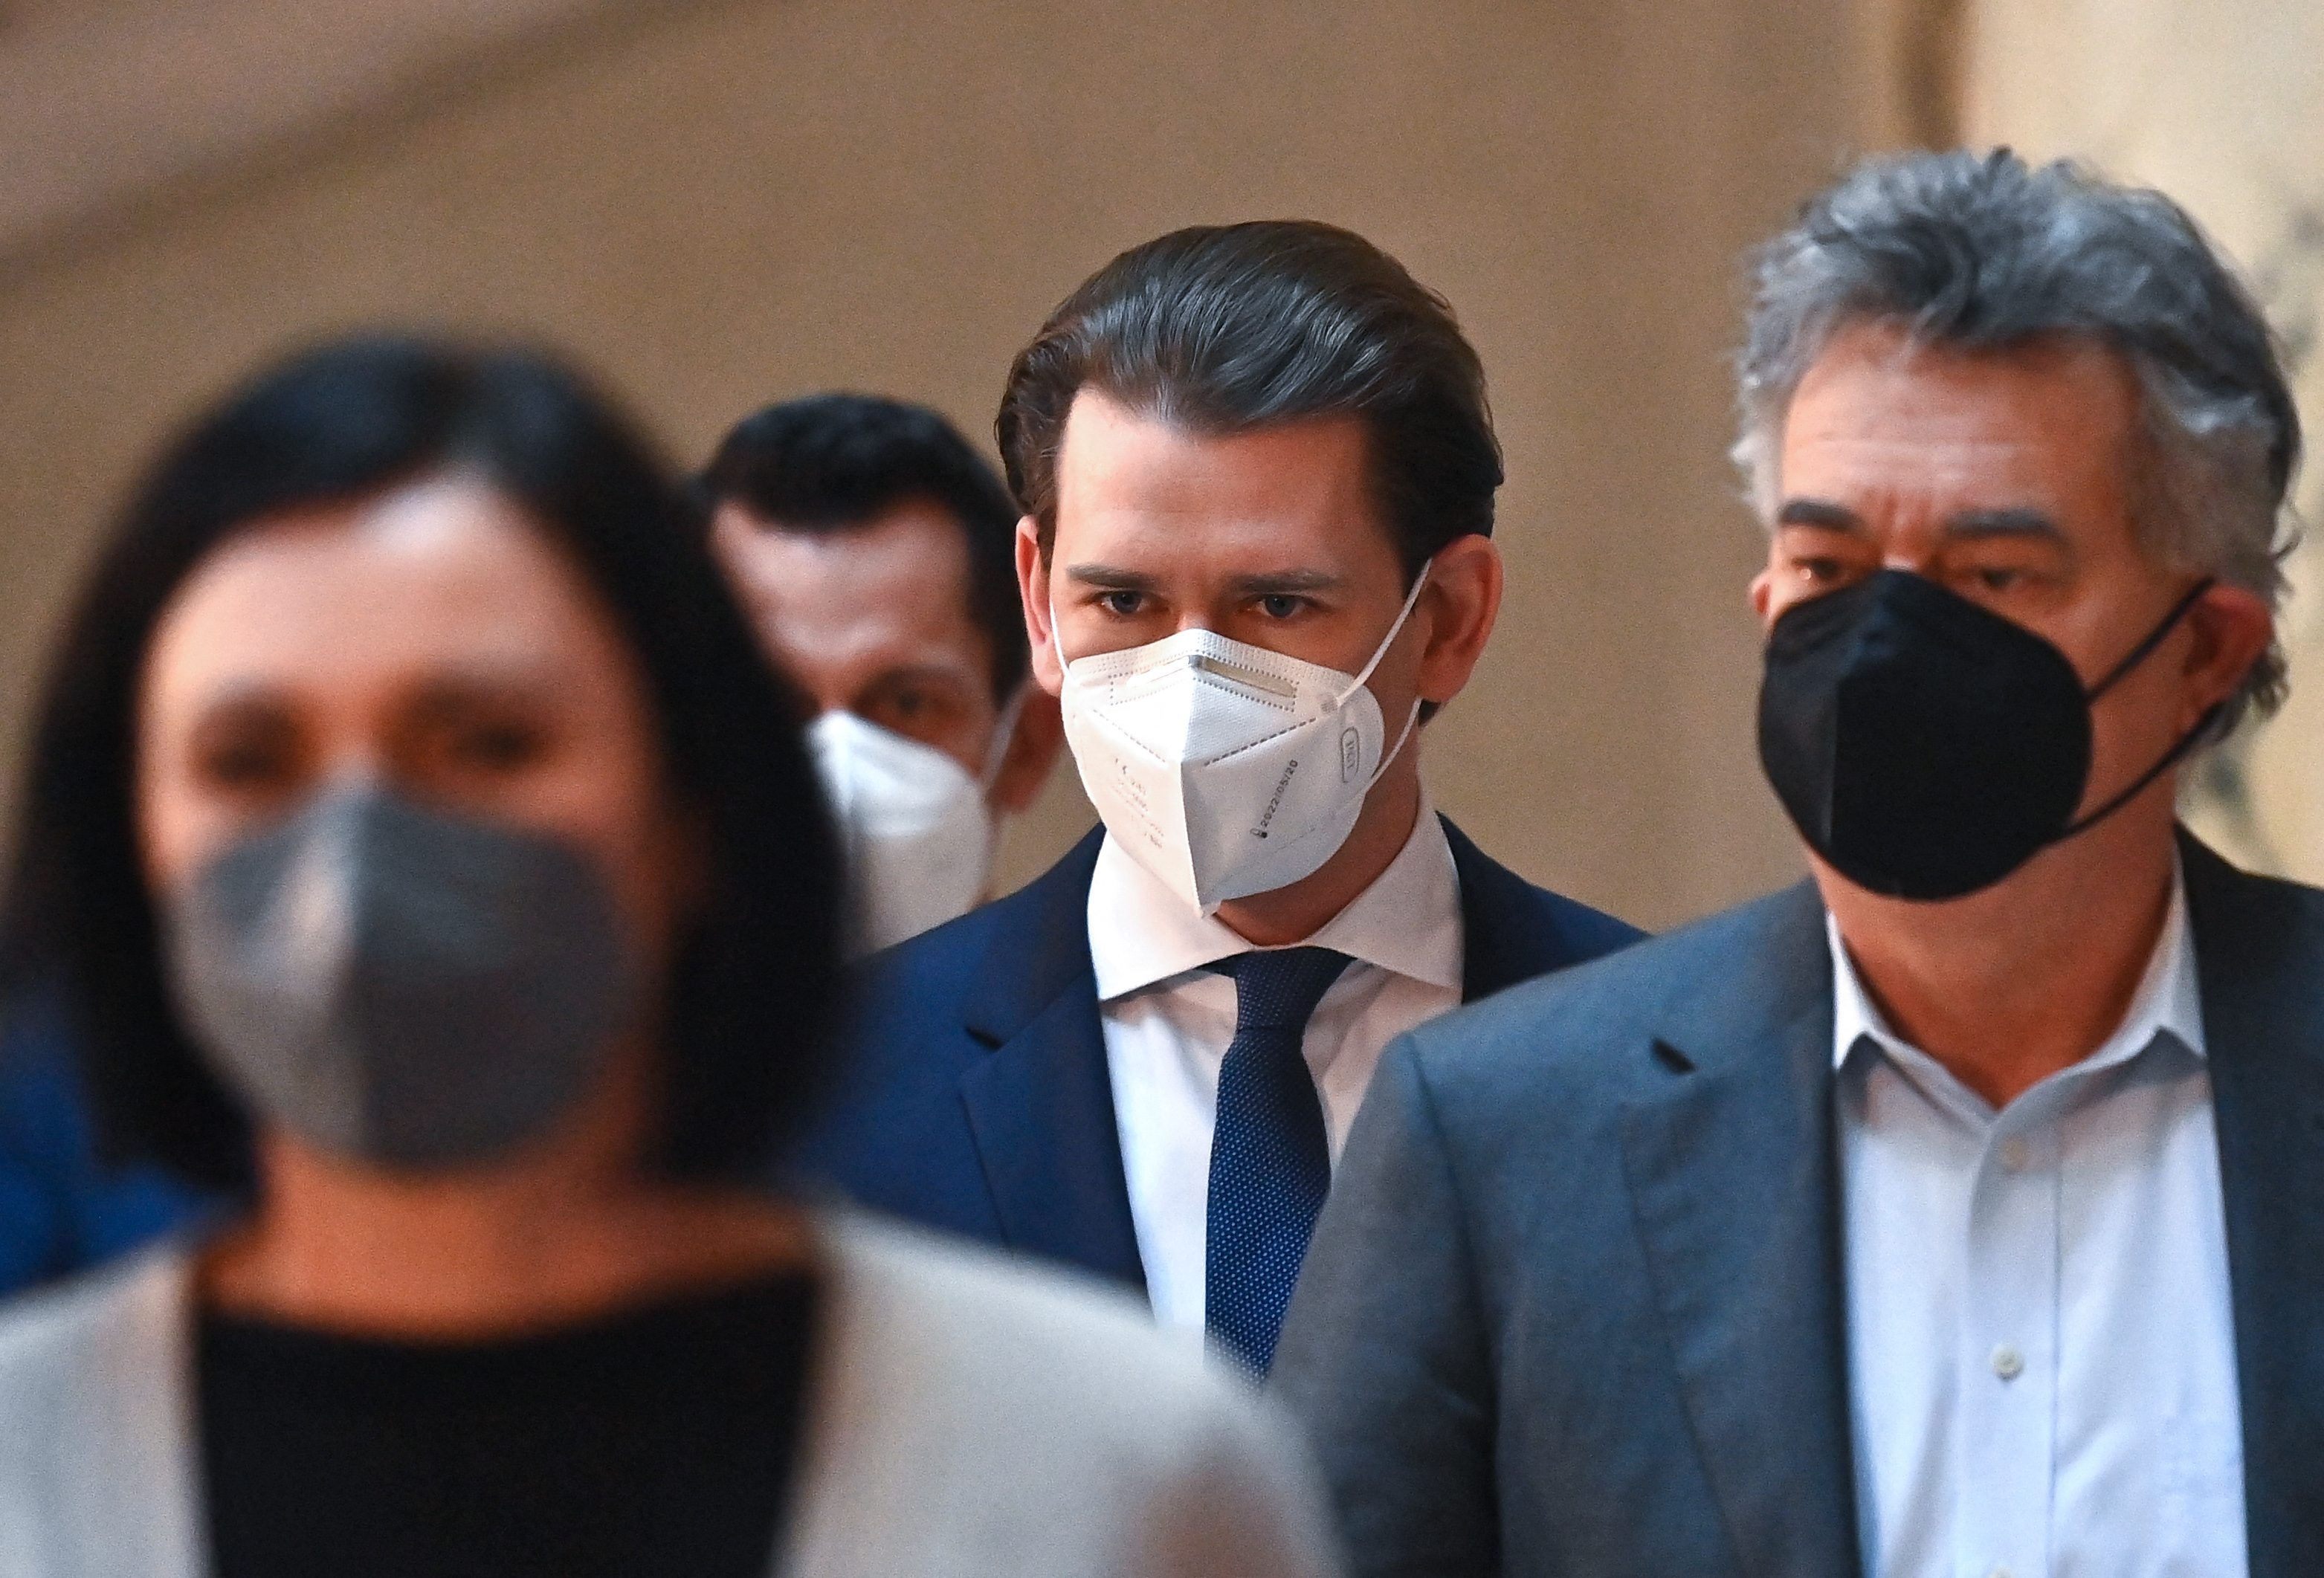 (chanceler conservador Sebastian Kurz. Foto: JOE KLAMAR / AFP)